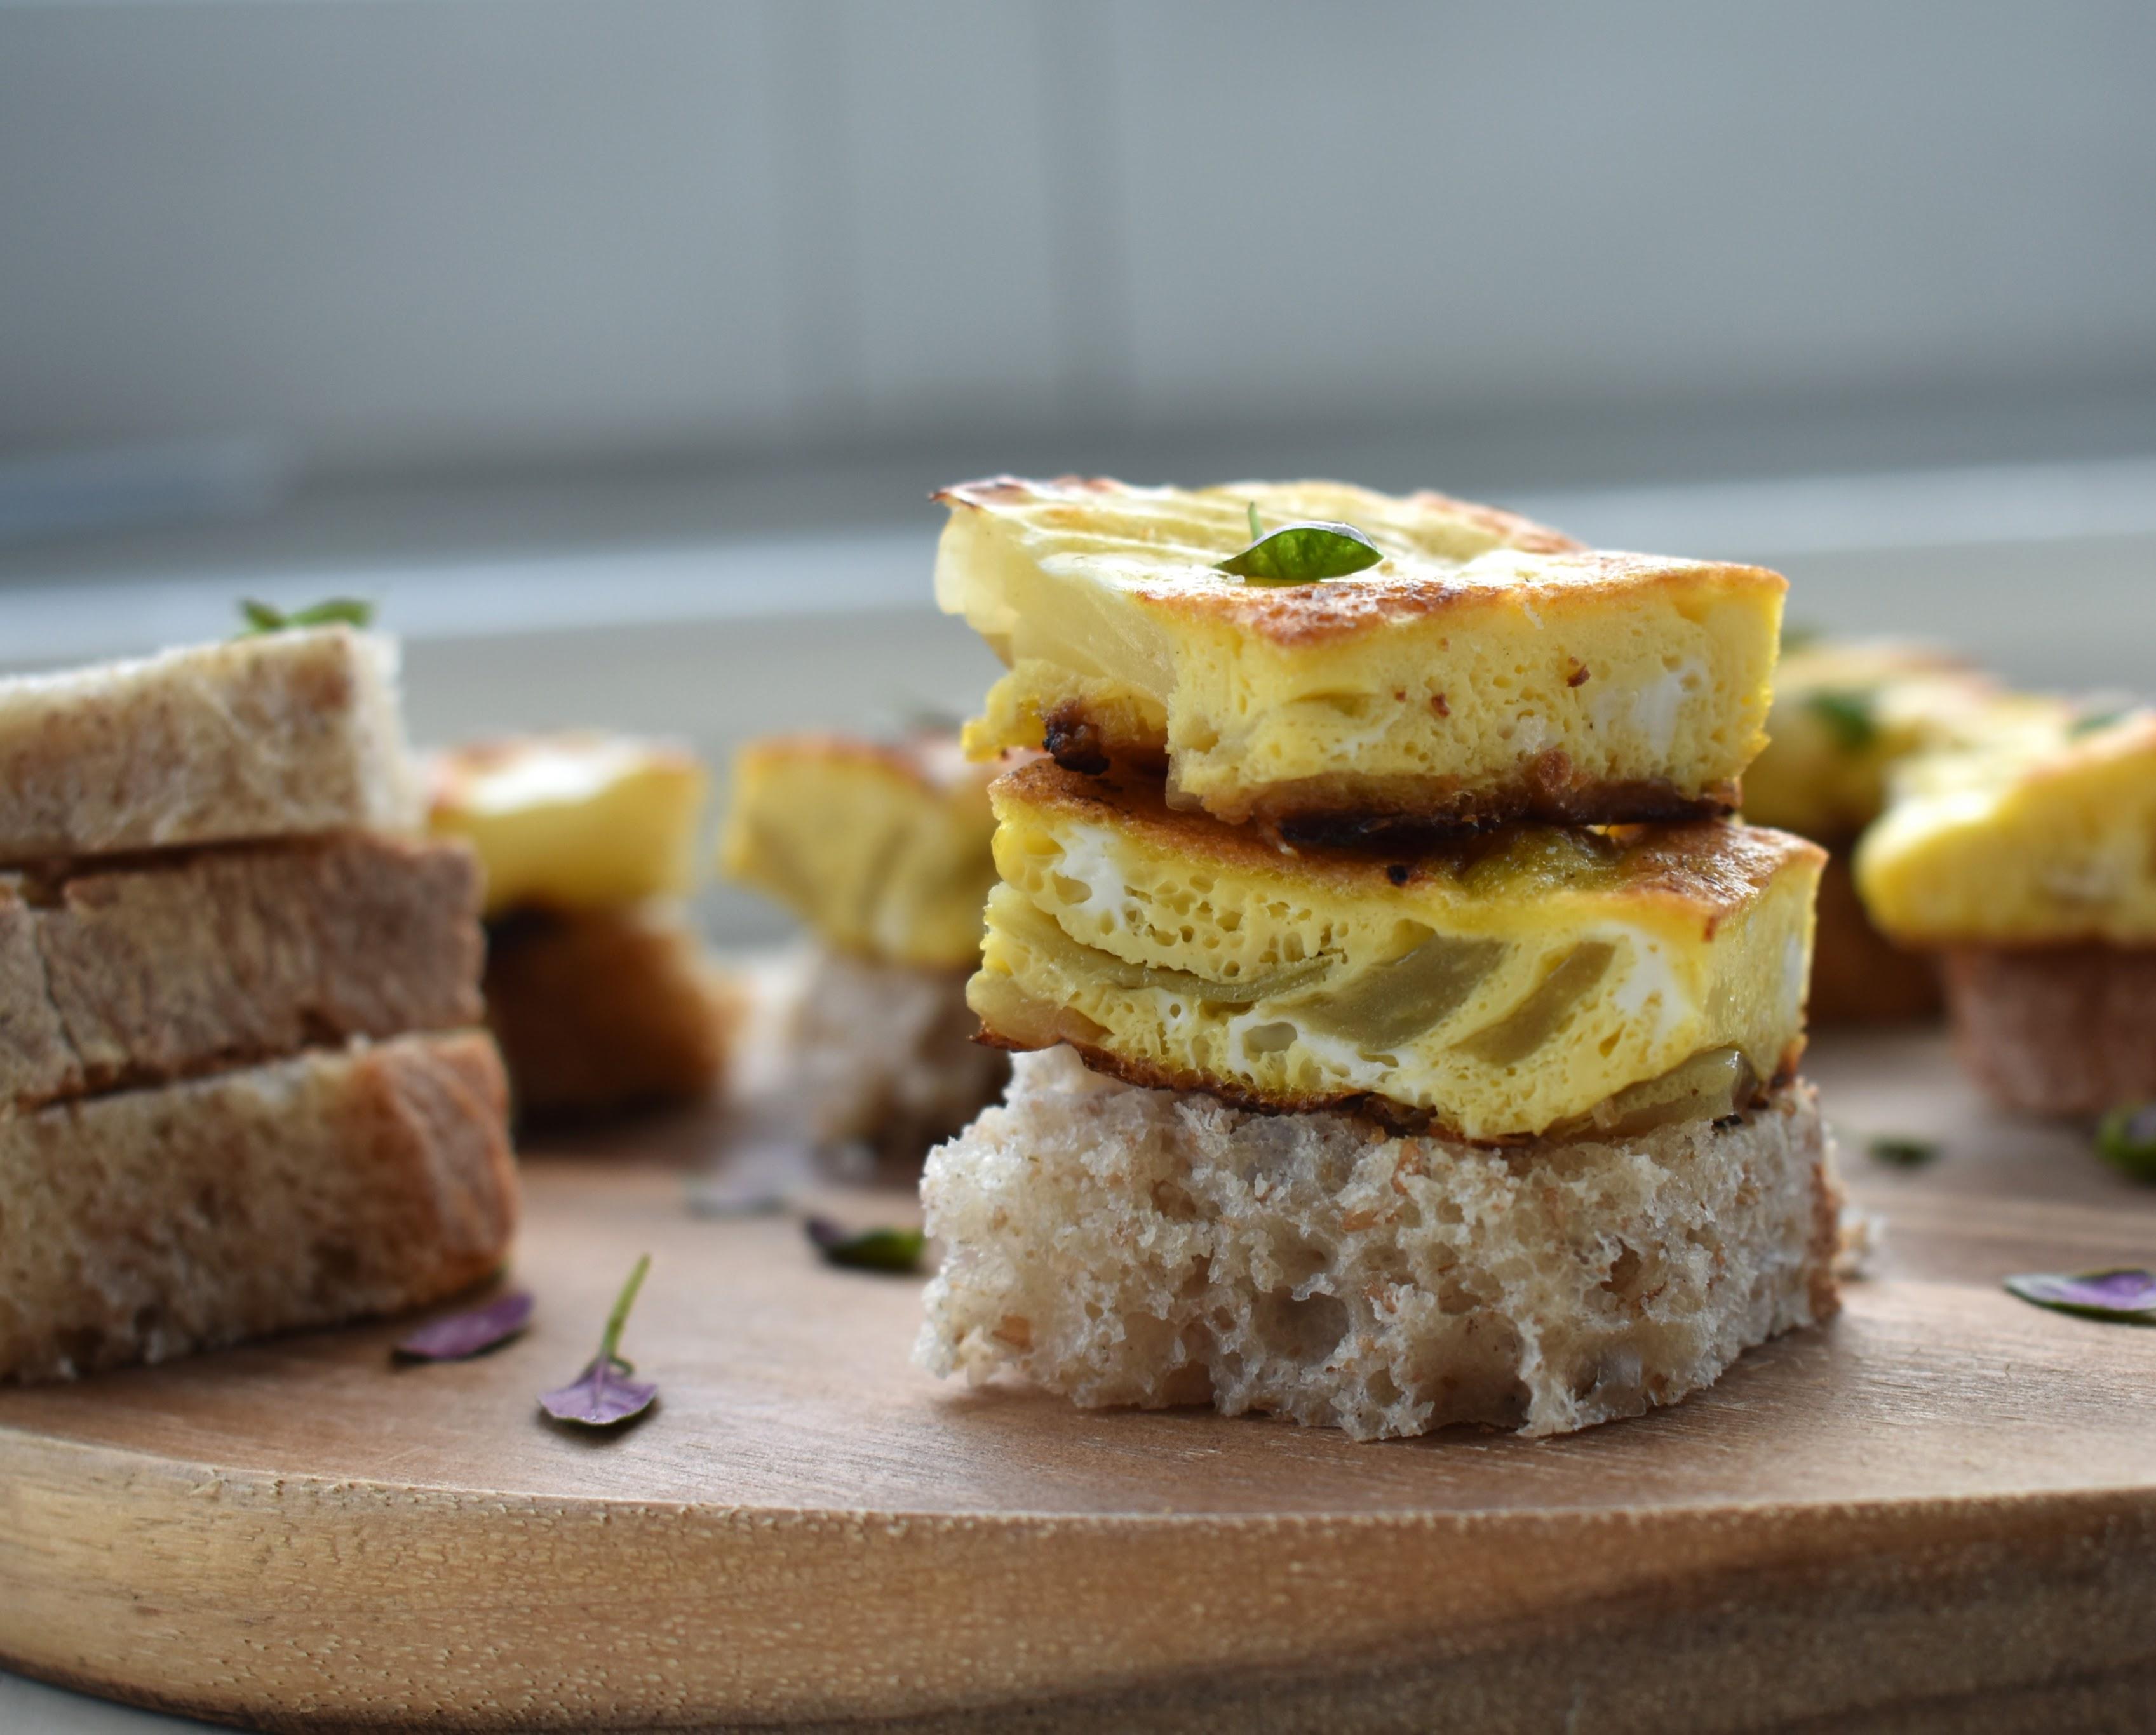 Stovetop Onion Frittata